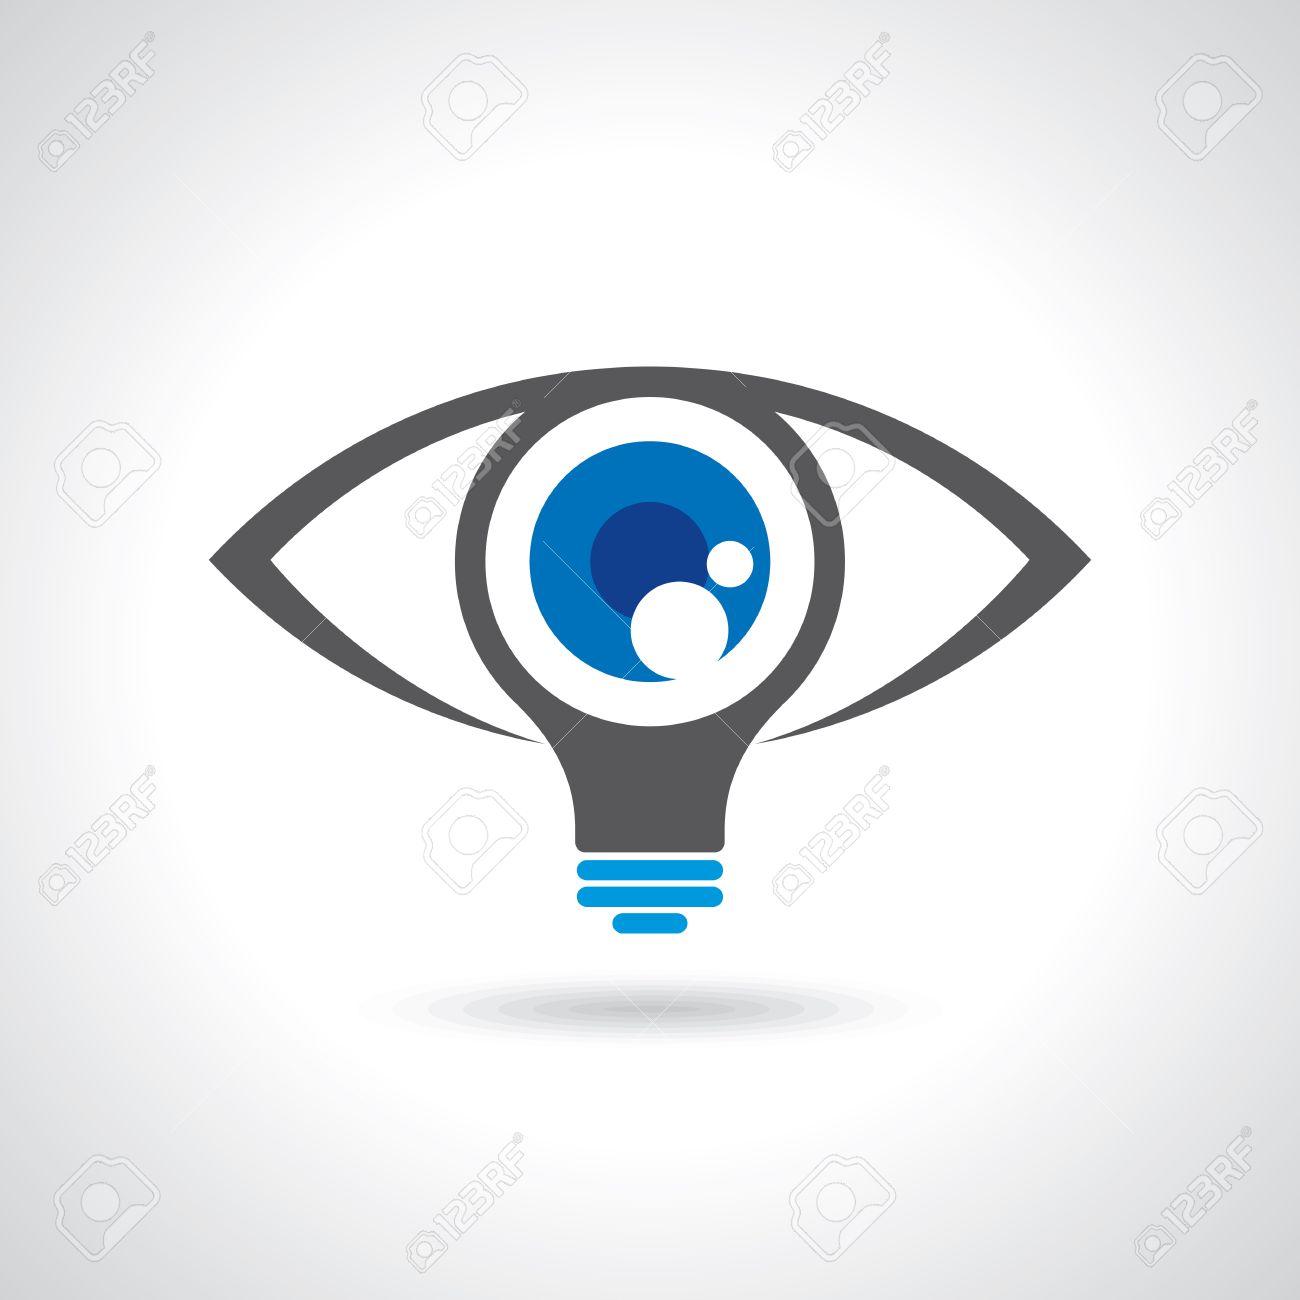 vision and ideas sign,eye icon,light bulb symbol ,business concept.vector illustration Standard-Bild - 42932242